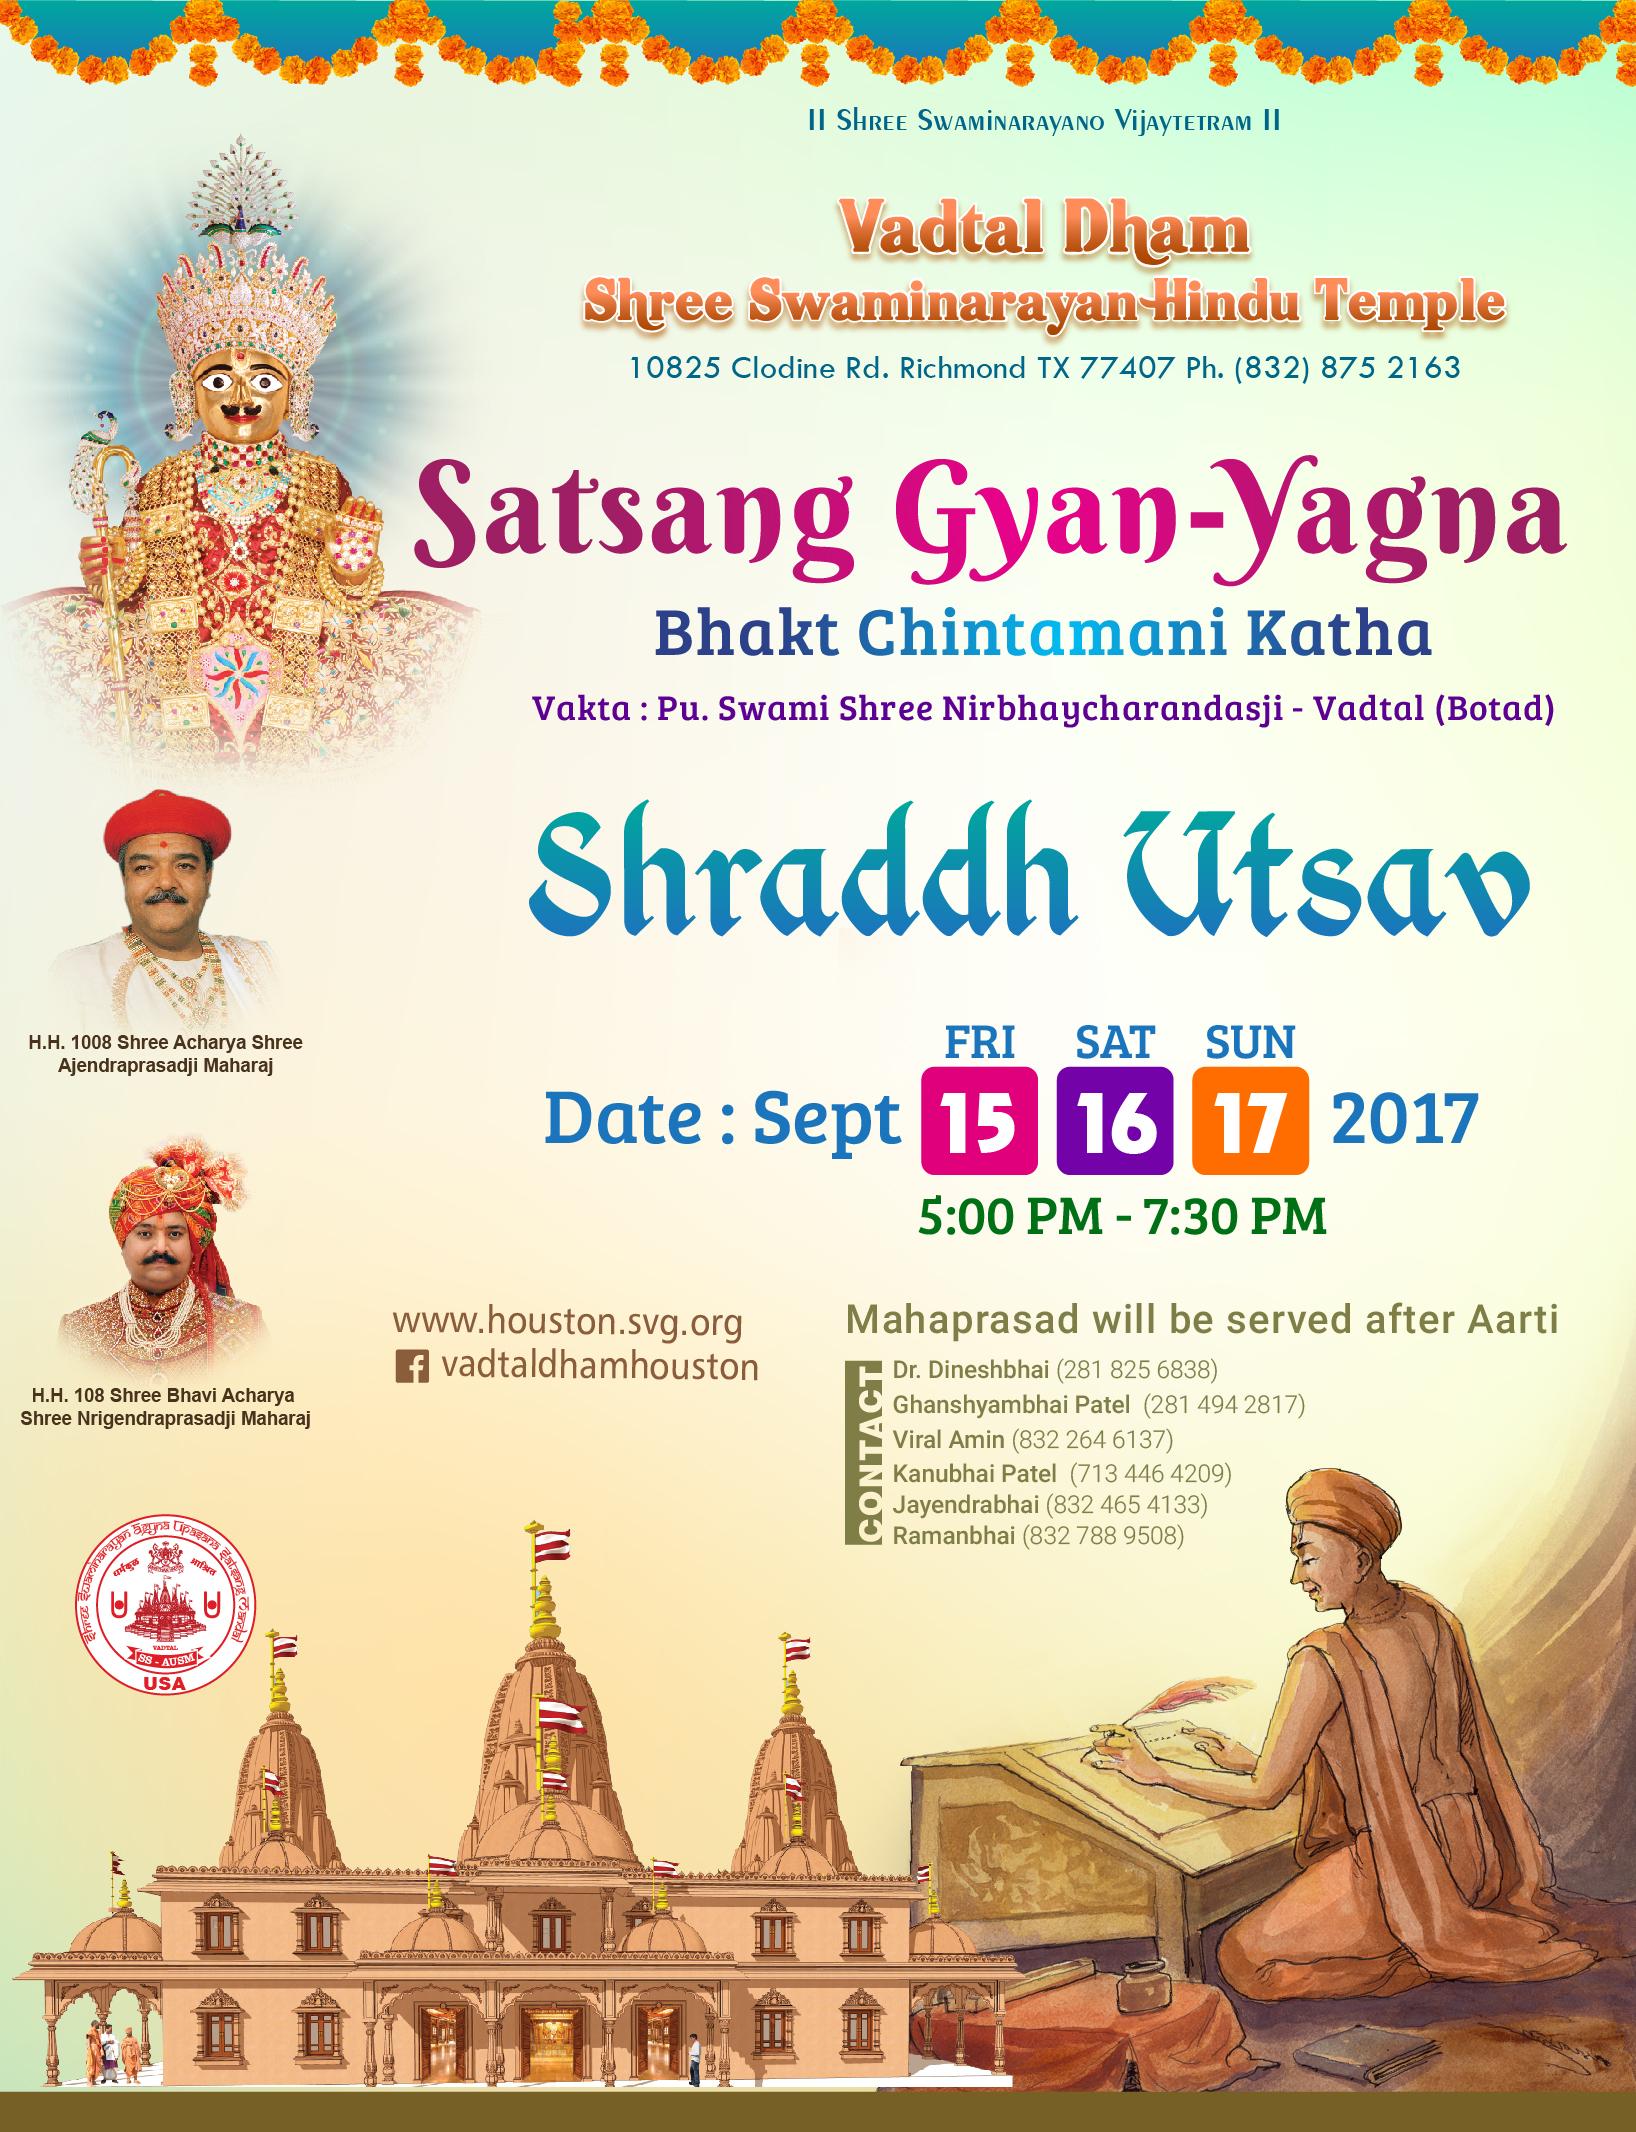 Satsang Gyan Yagna Swaminarayan